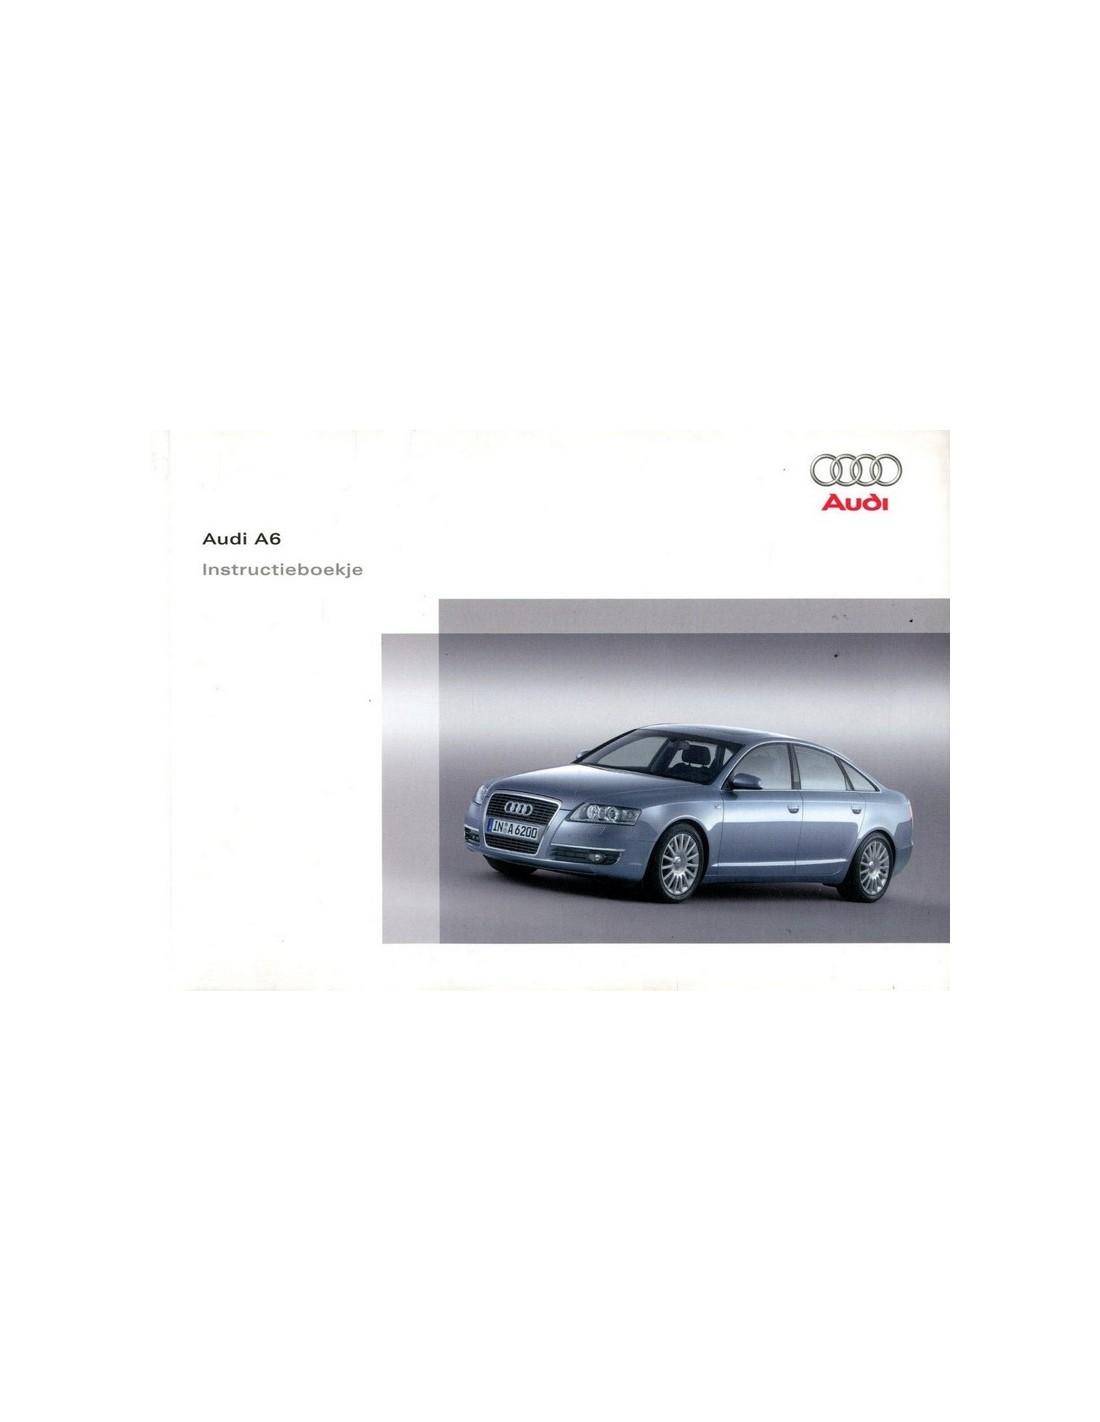 2005 audi a6 avant owners manual handbook dutch rh autolit eu 2005 audi a6 owners manual Audi A7 Manual